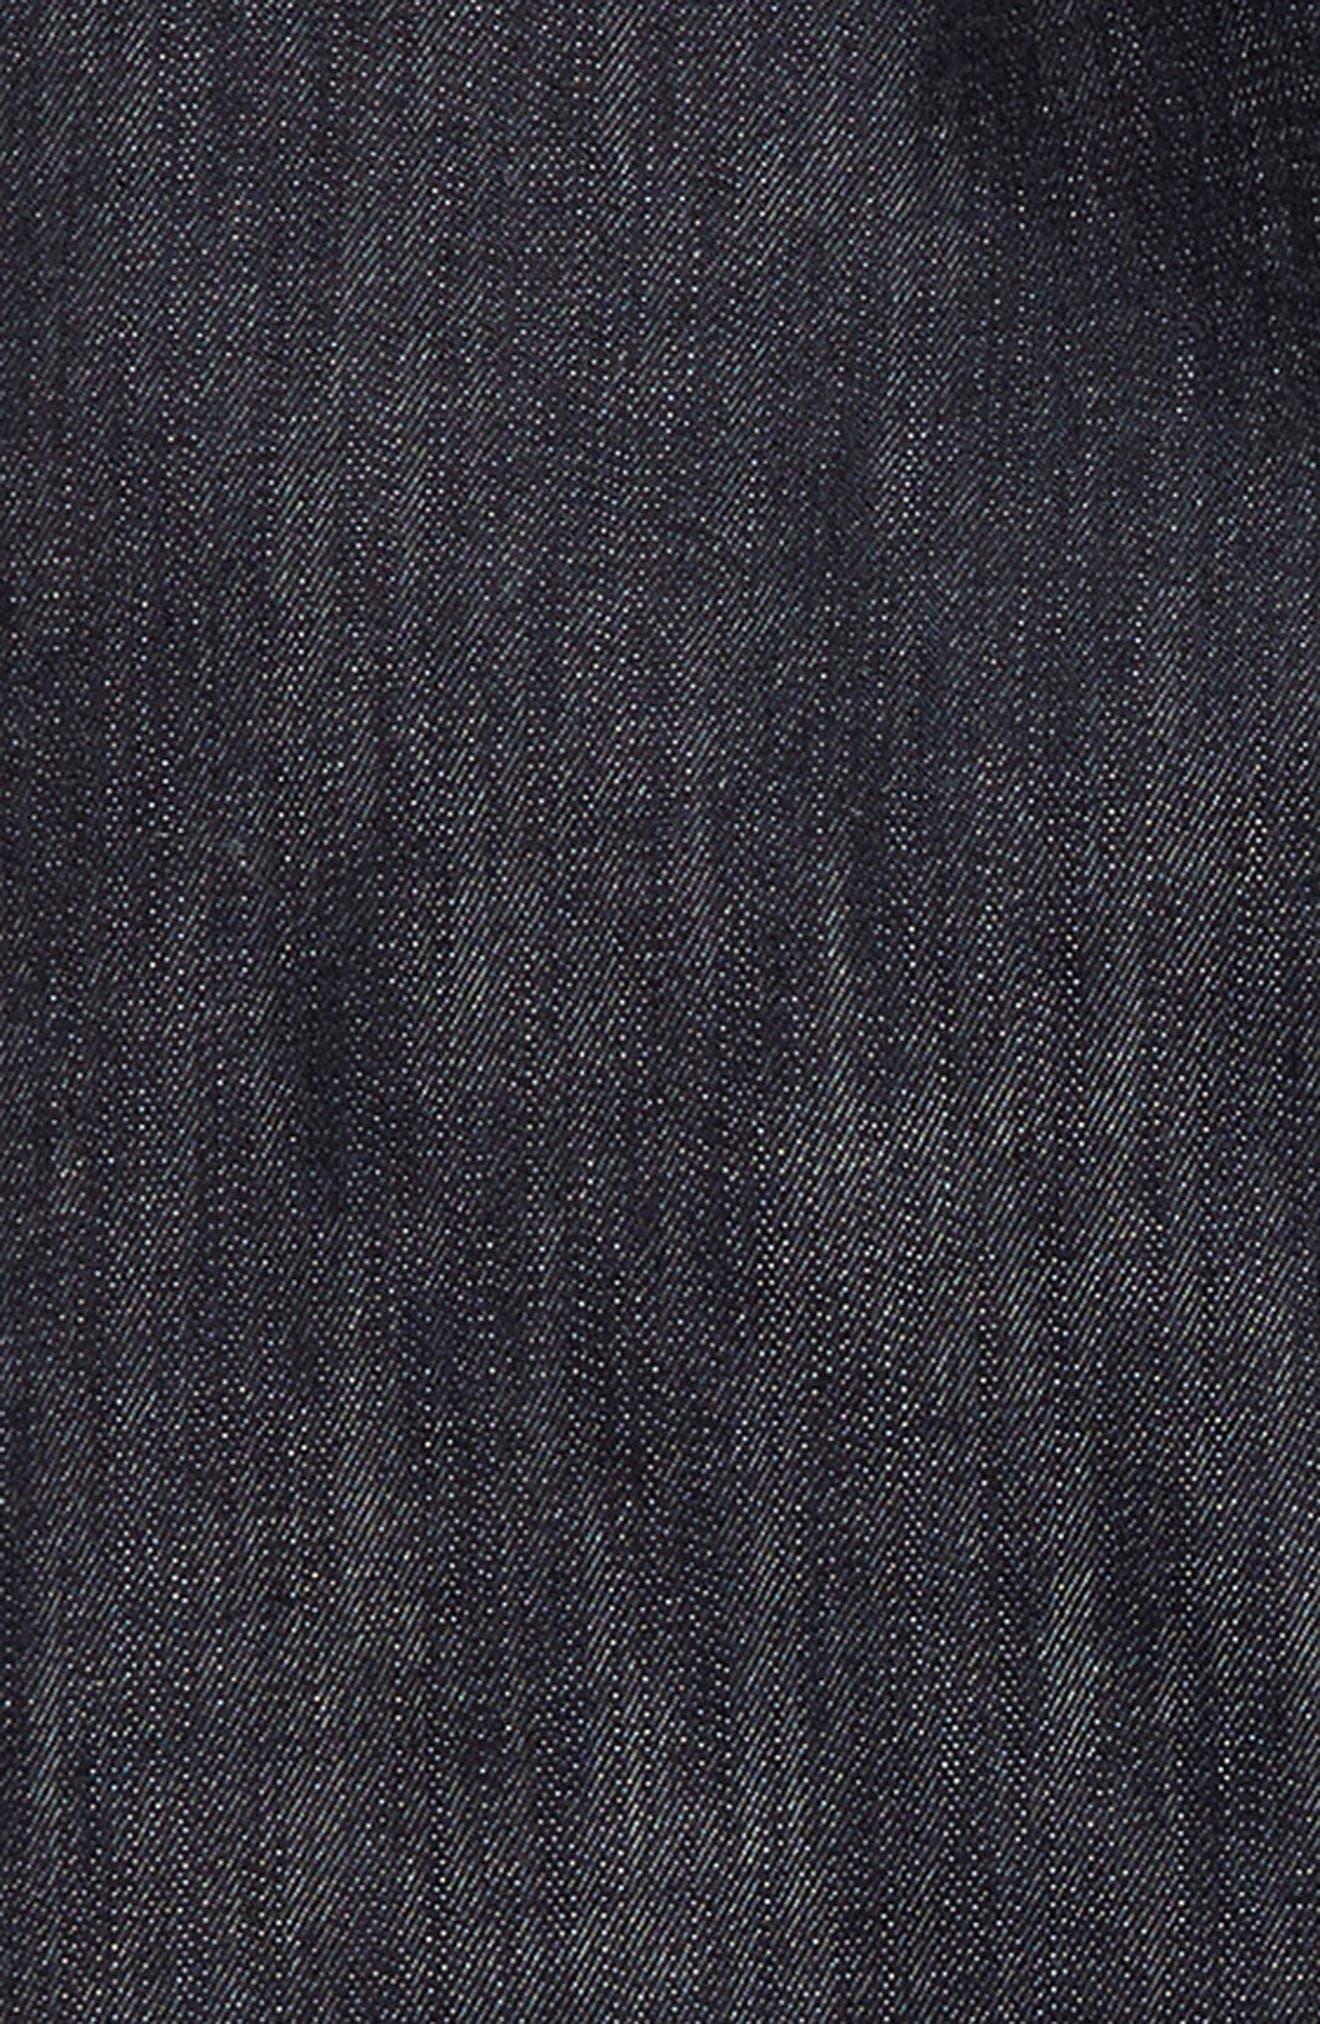 Alternate Image 3  - Levi's® 541™ Athletic Fit Jeans (Big Boys)